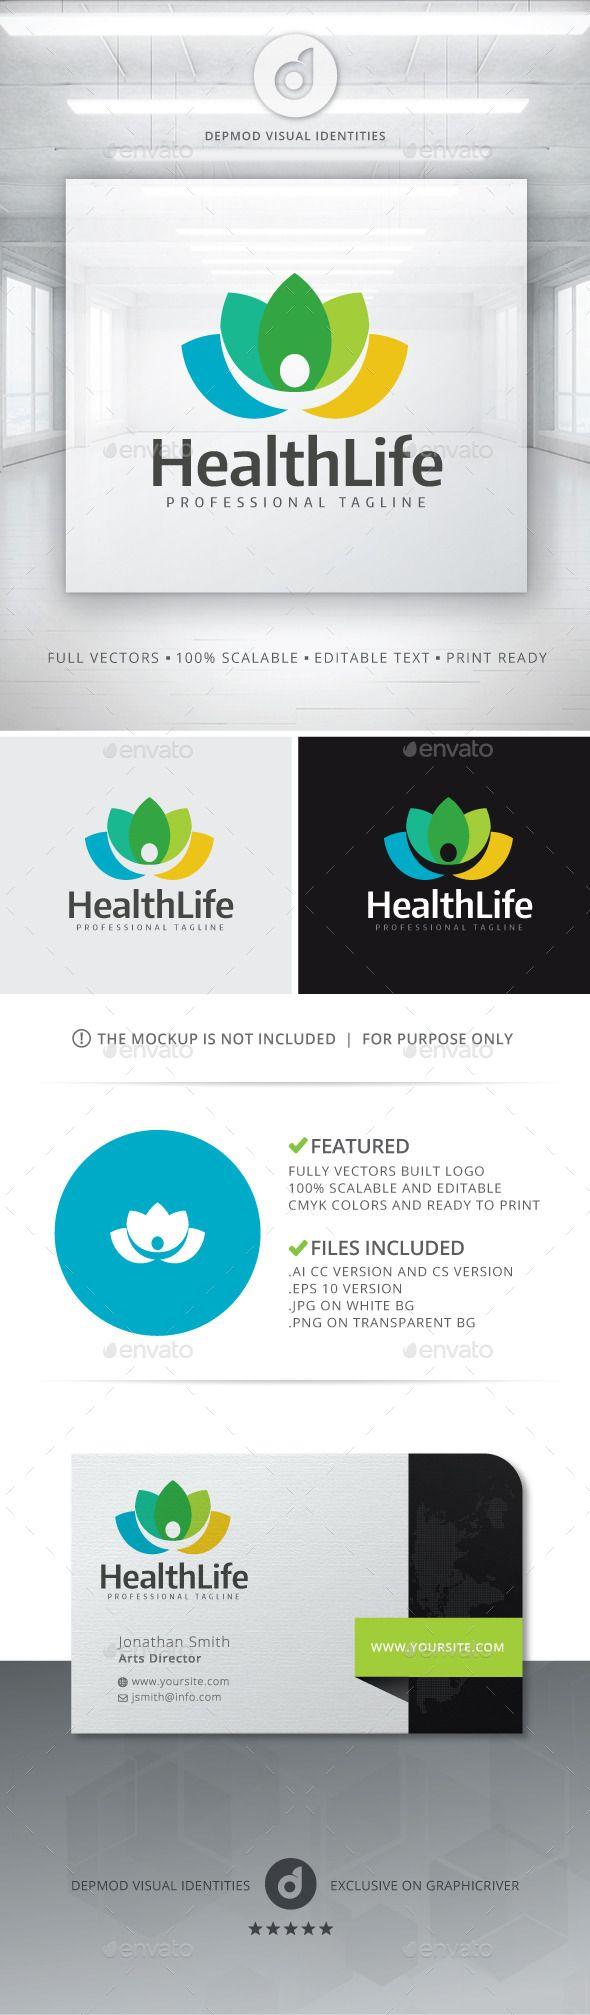 Health Life Logo Template Vector EPS, AI. Download here: http://graphicriver.net/item/health-life-logo/11454318?ref=ksioks